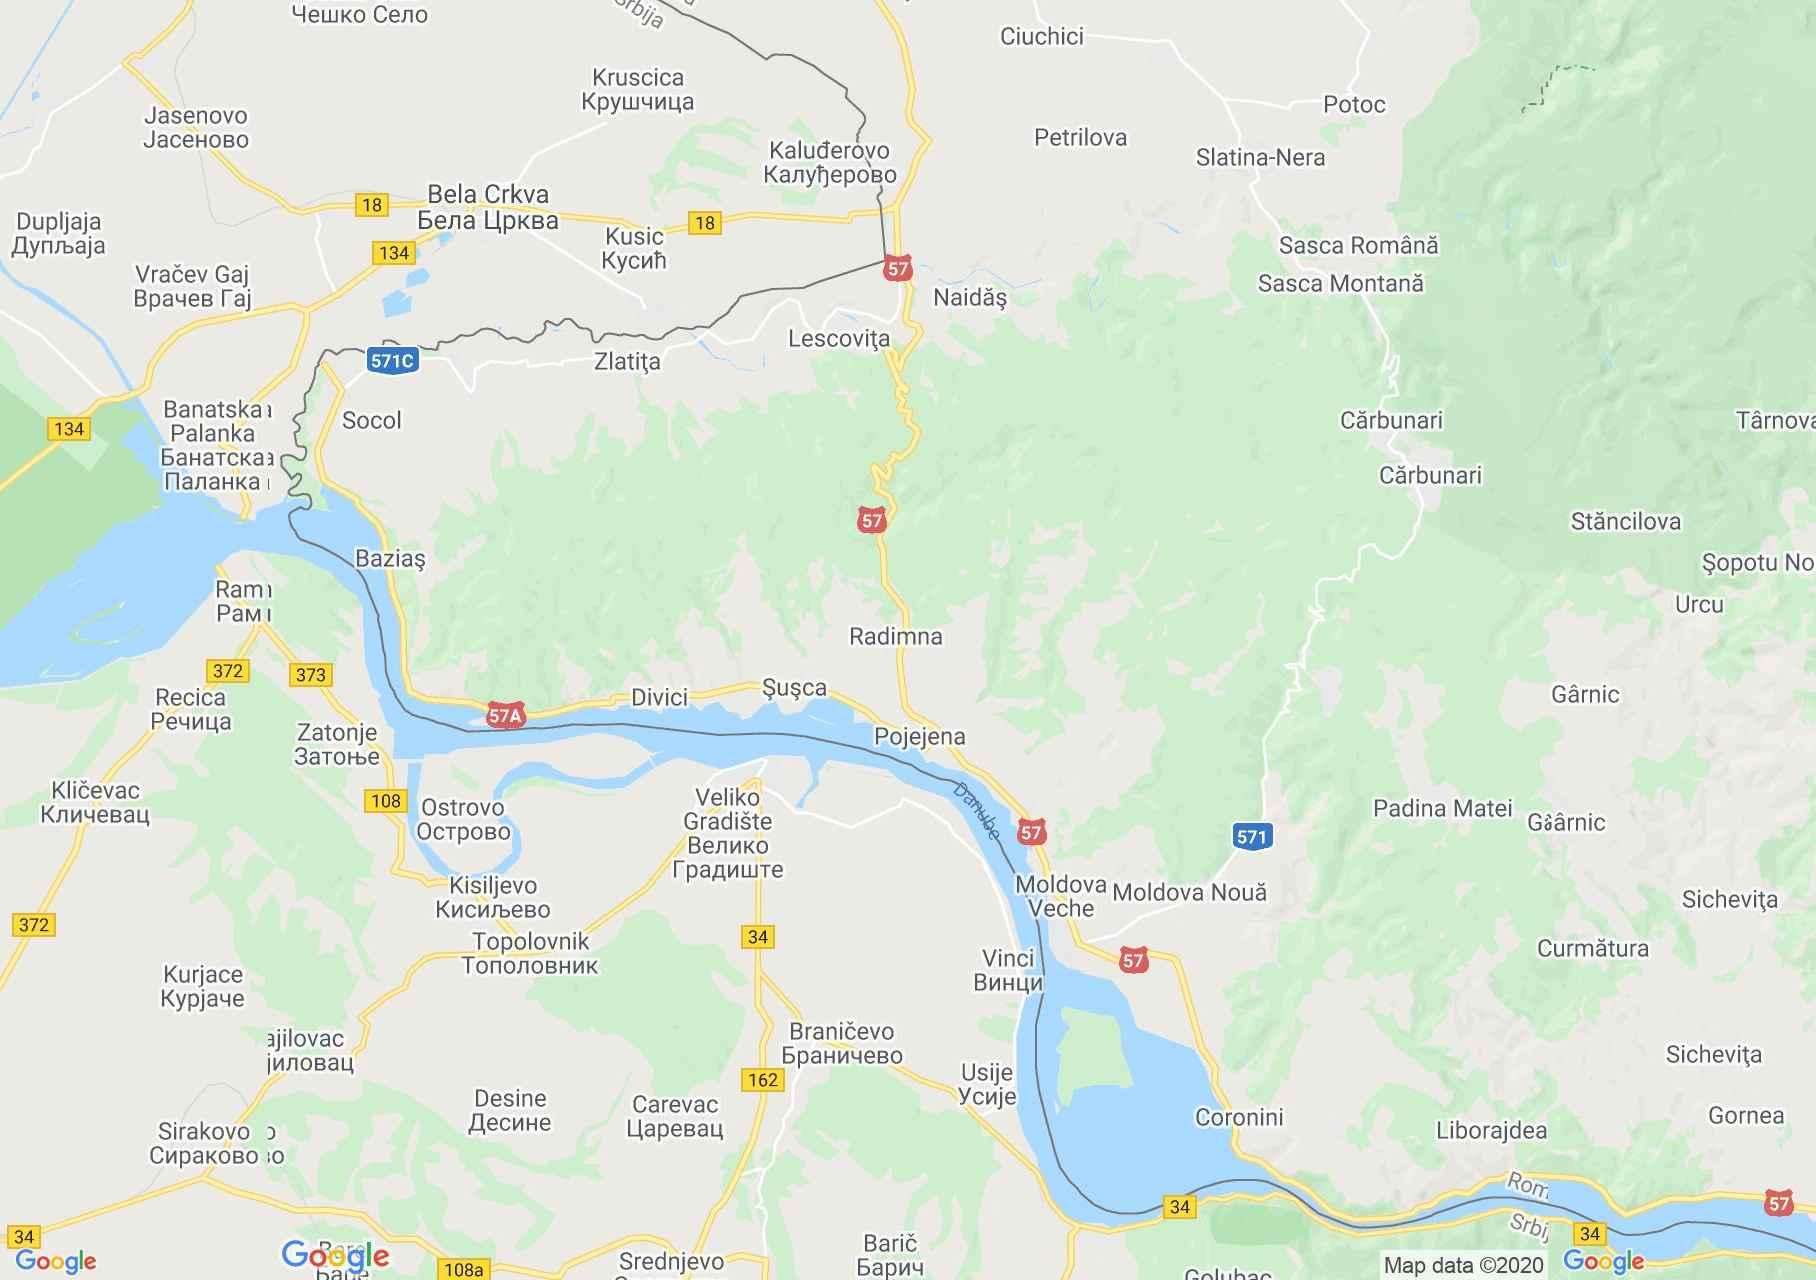 Baziaş-Moldova Nouă coronin area, Interactive tourist map